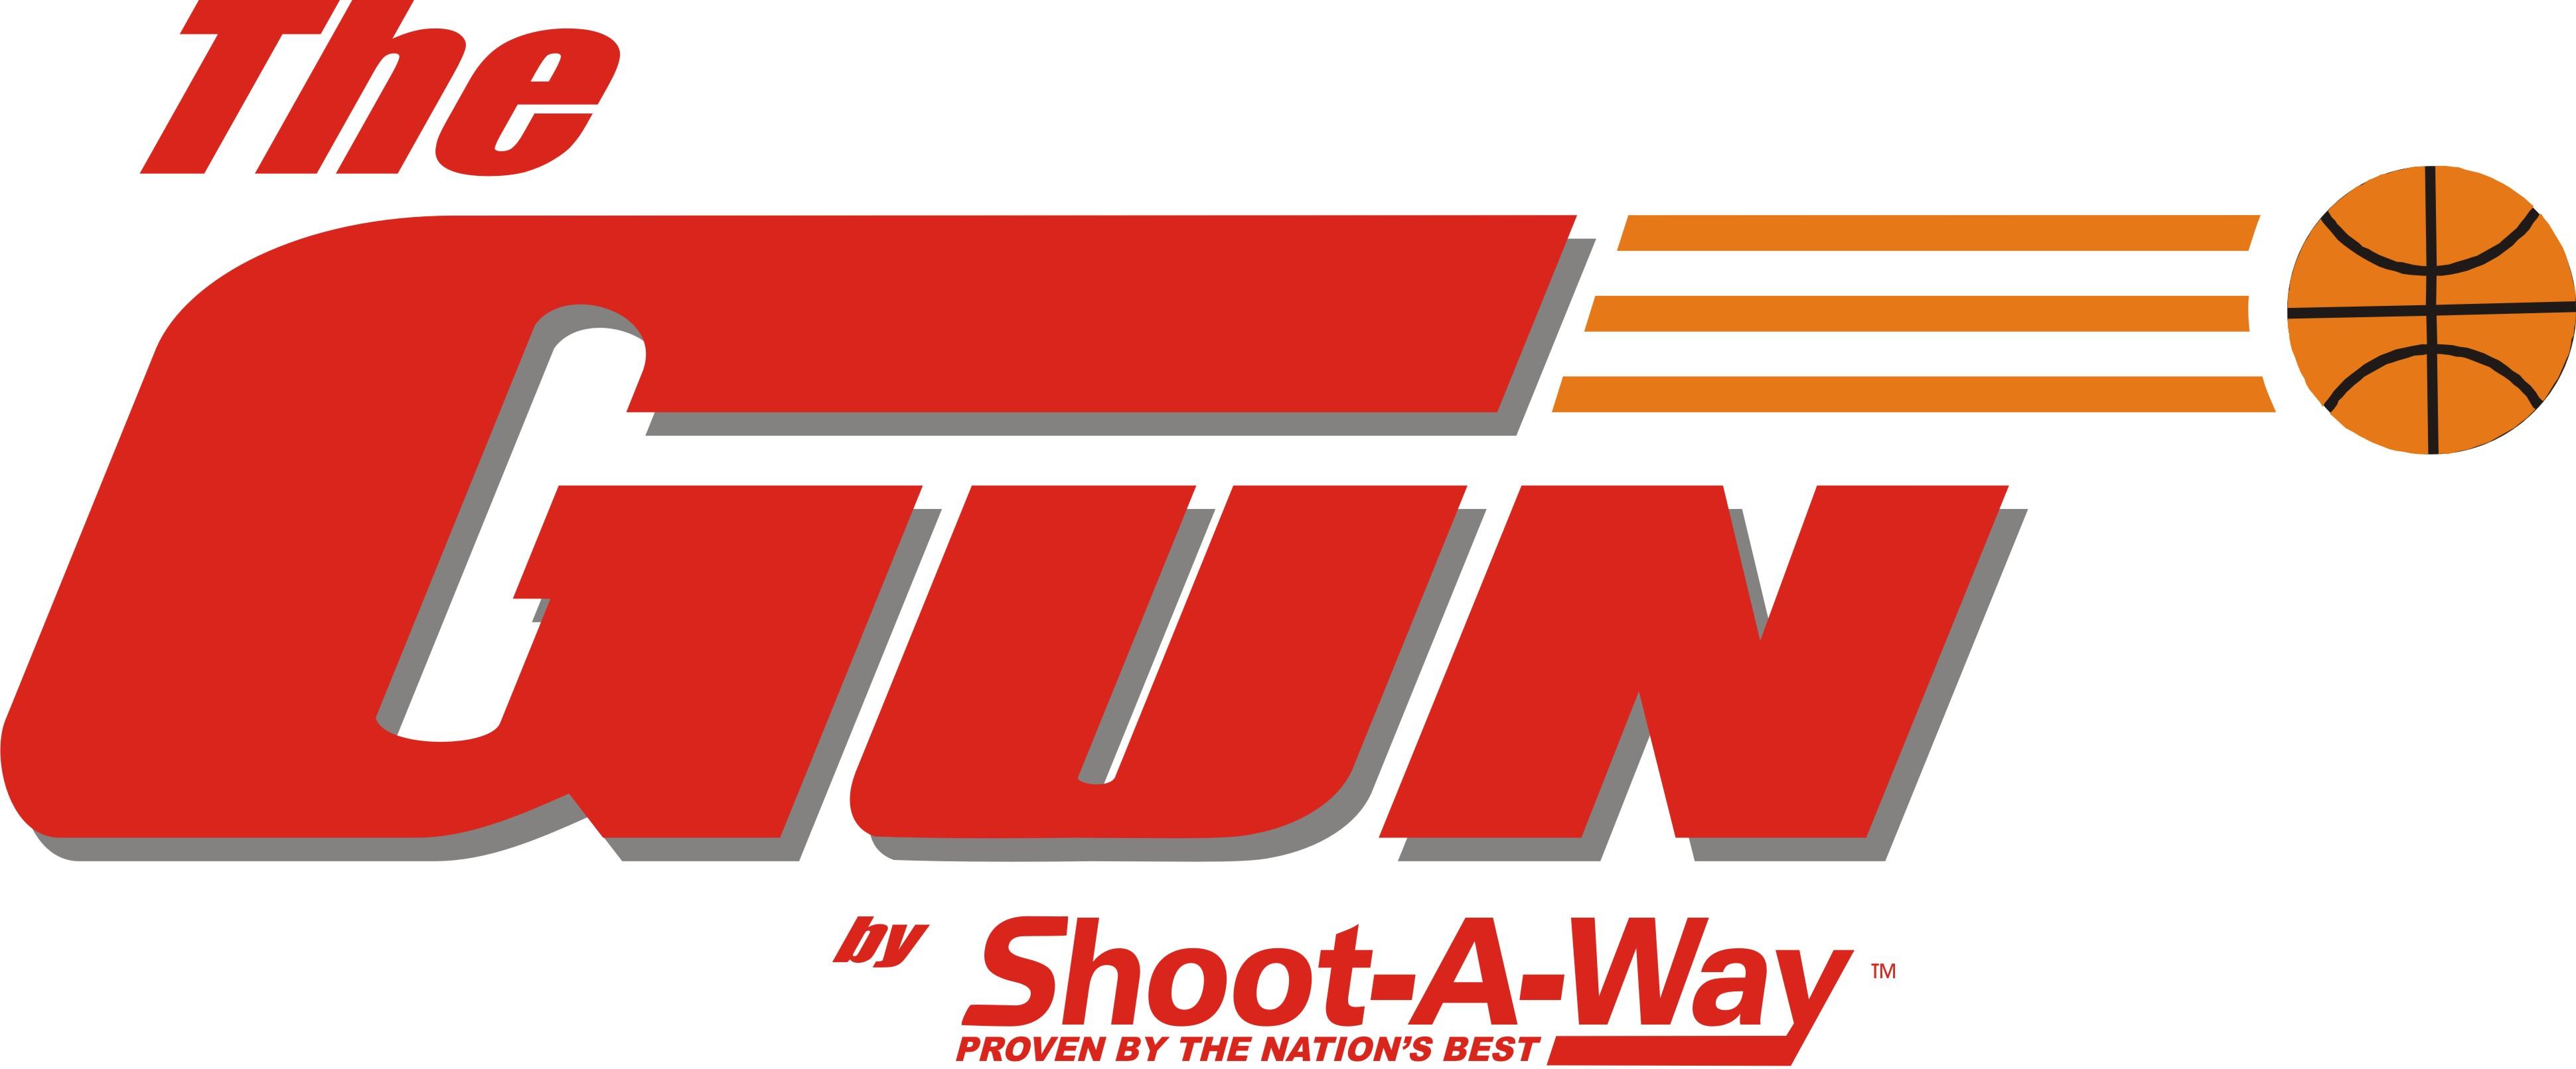 Shoot-A-Way